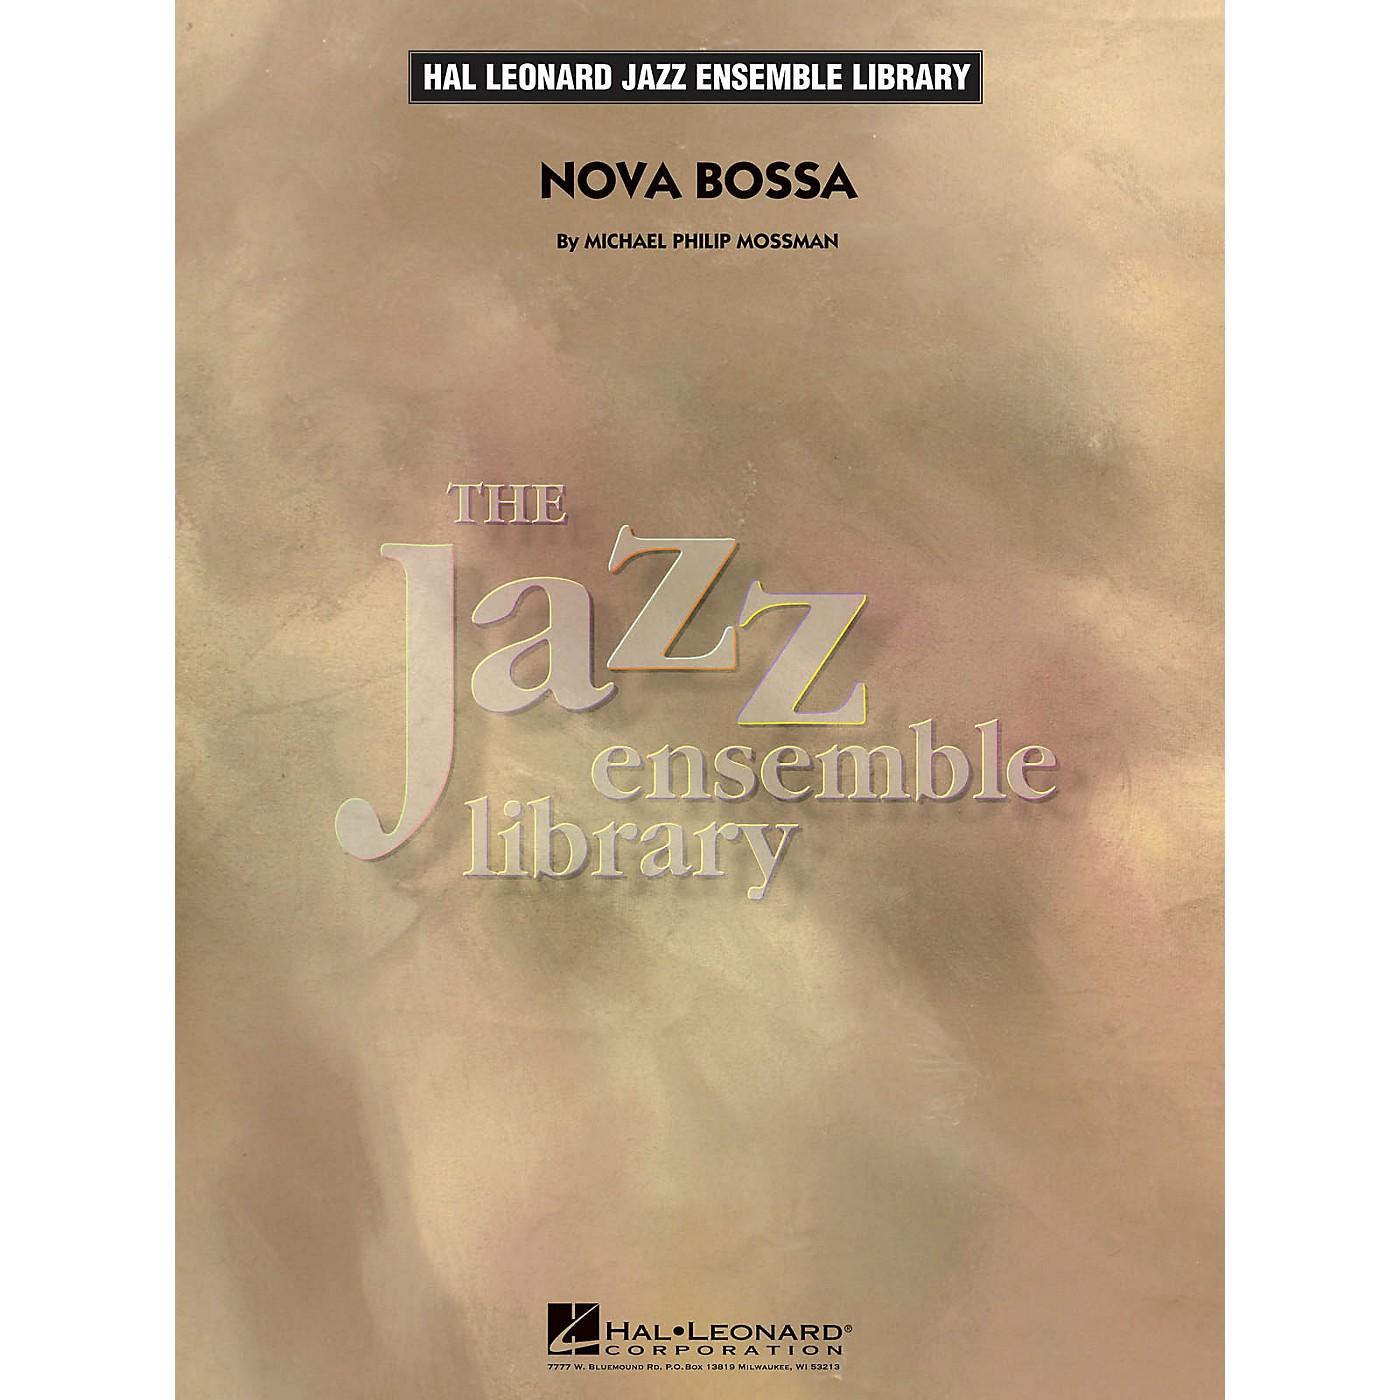 Hal Leonard Nova Bossa Jazz Band Level 4 Composed by Michael Philip Mossman thumbnail